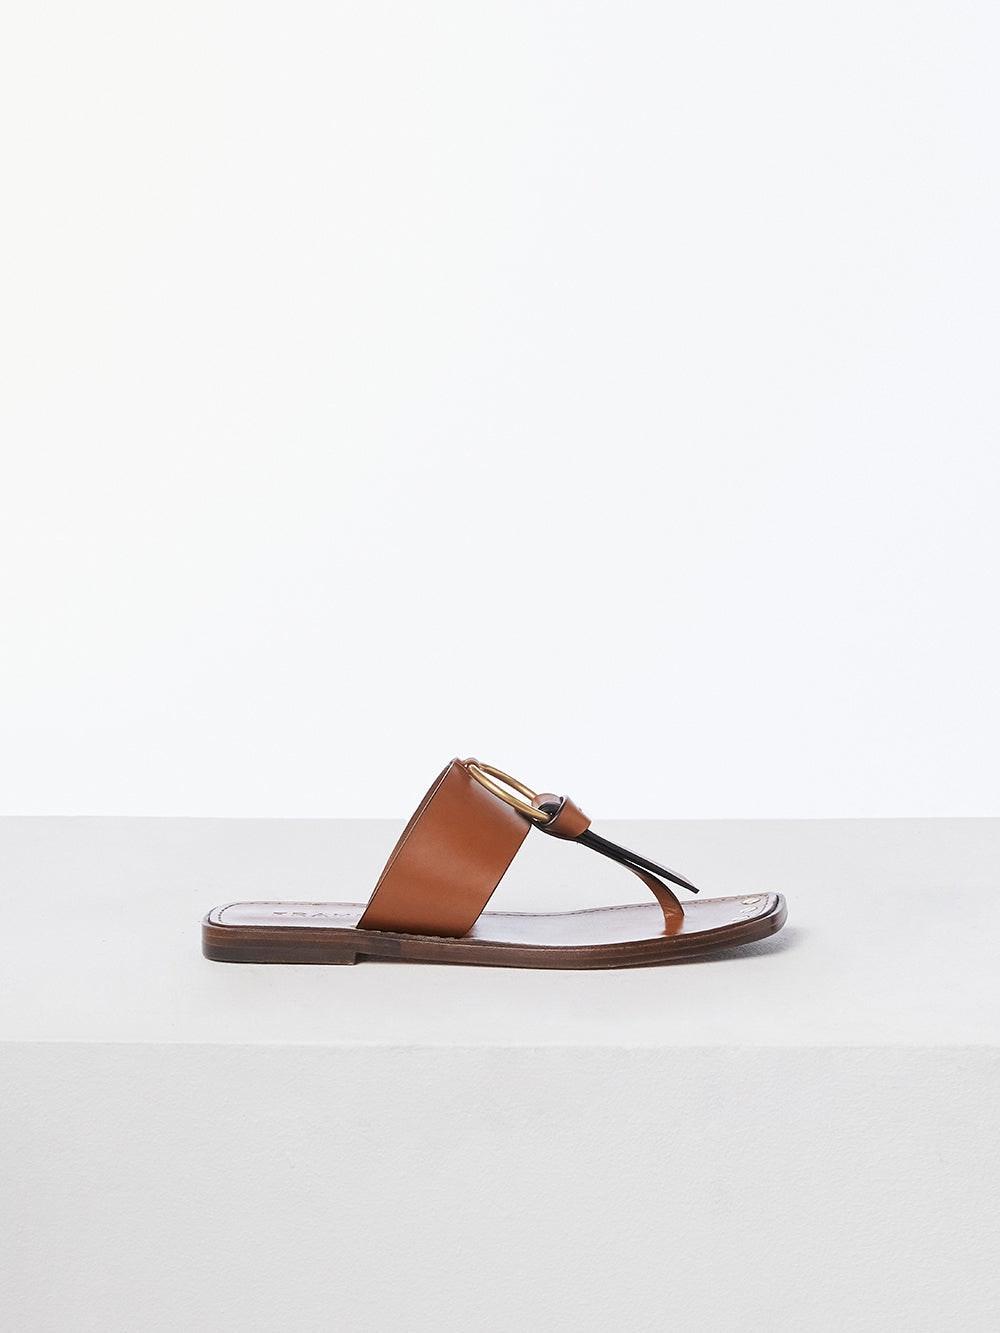 shoe side view